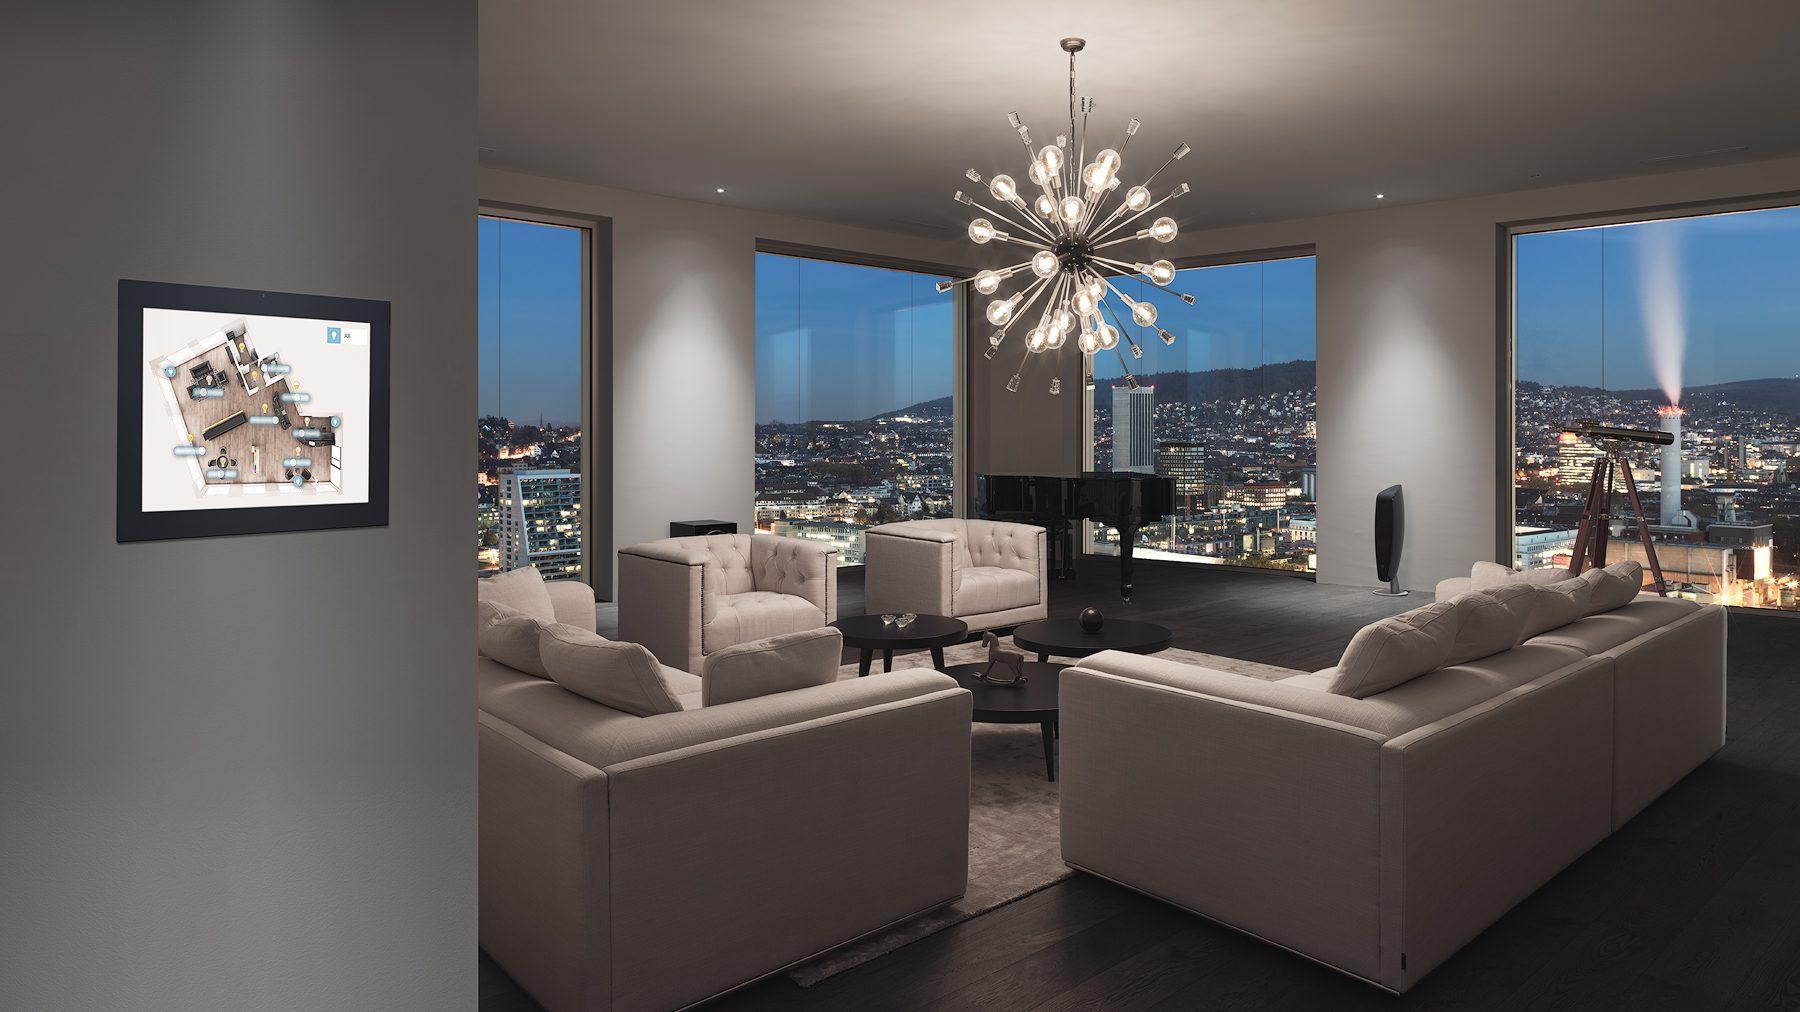 Interiorfotografie / smart Place / Implementierung / Penthouse / Mobimo Tower / Zürich